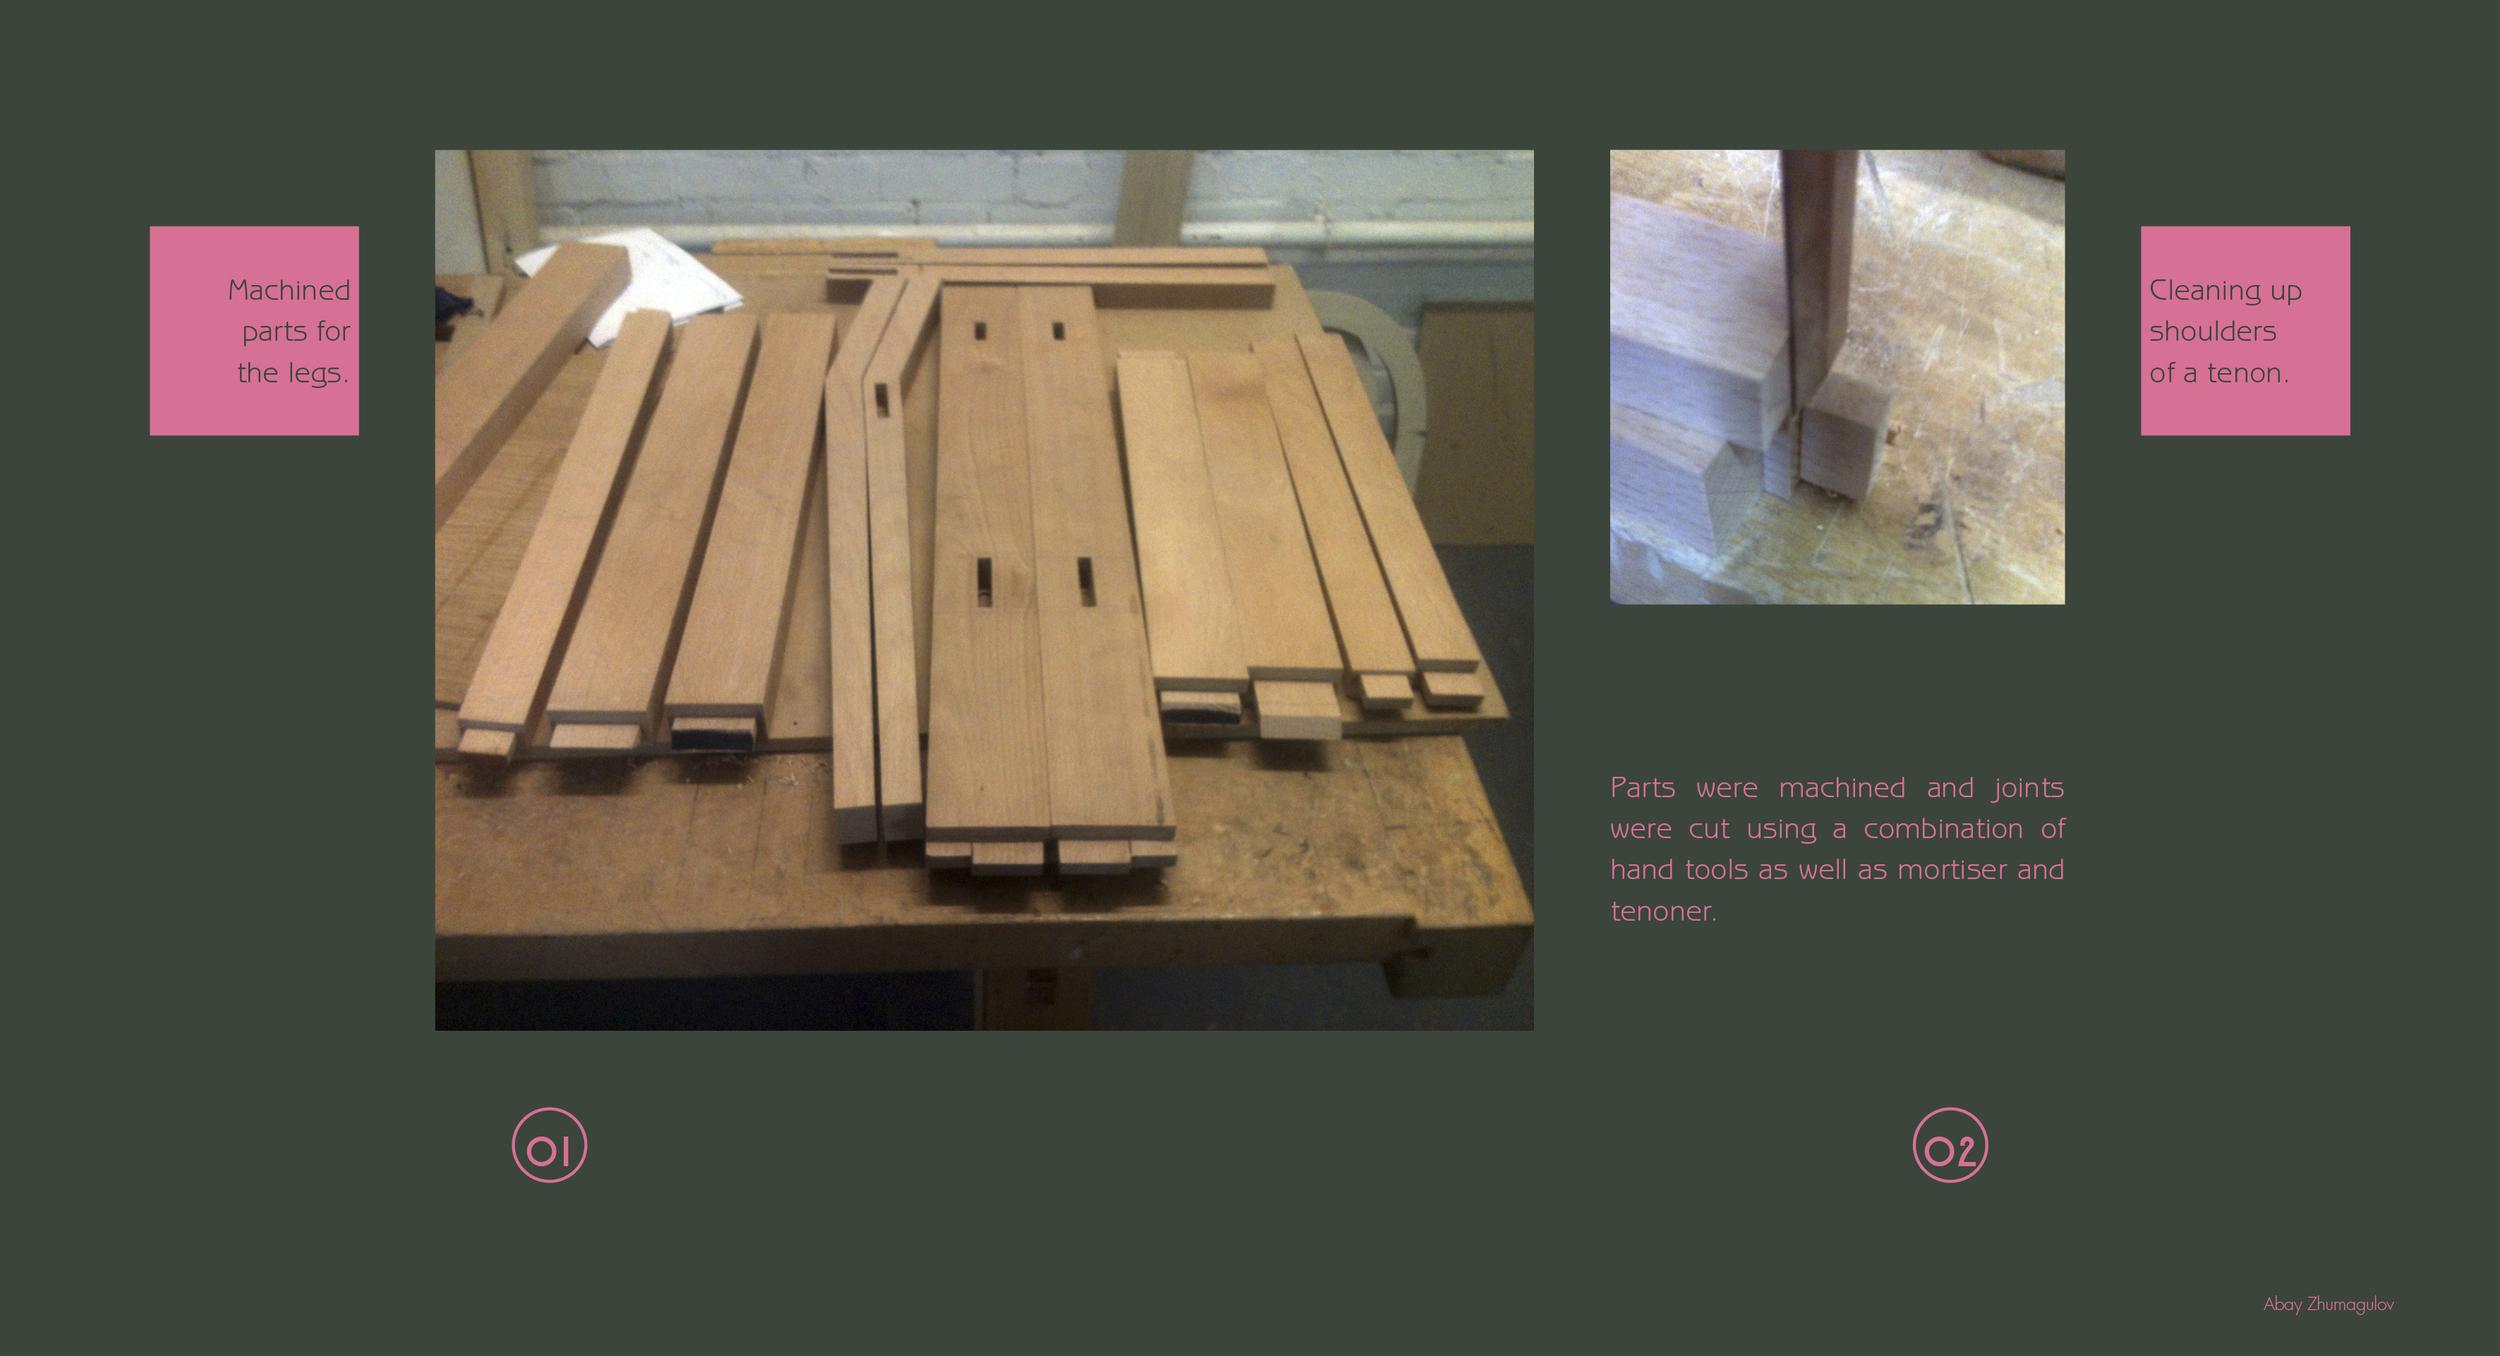 Woodworking Green3.jpg